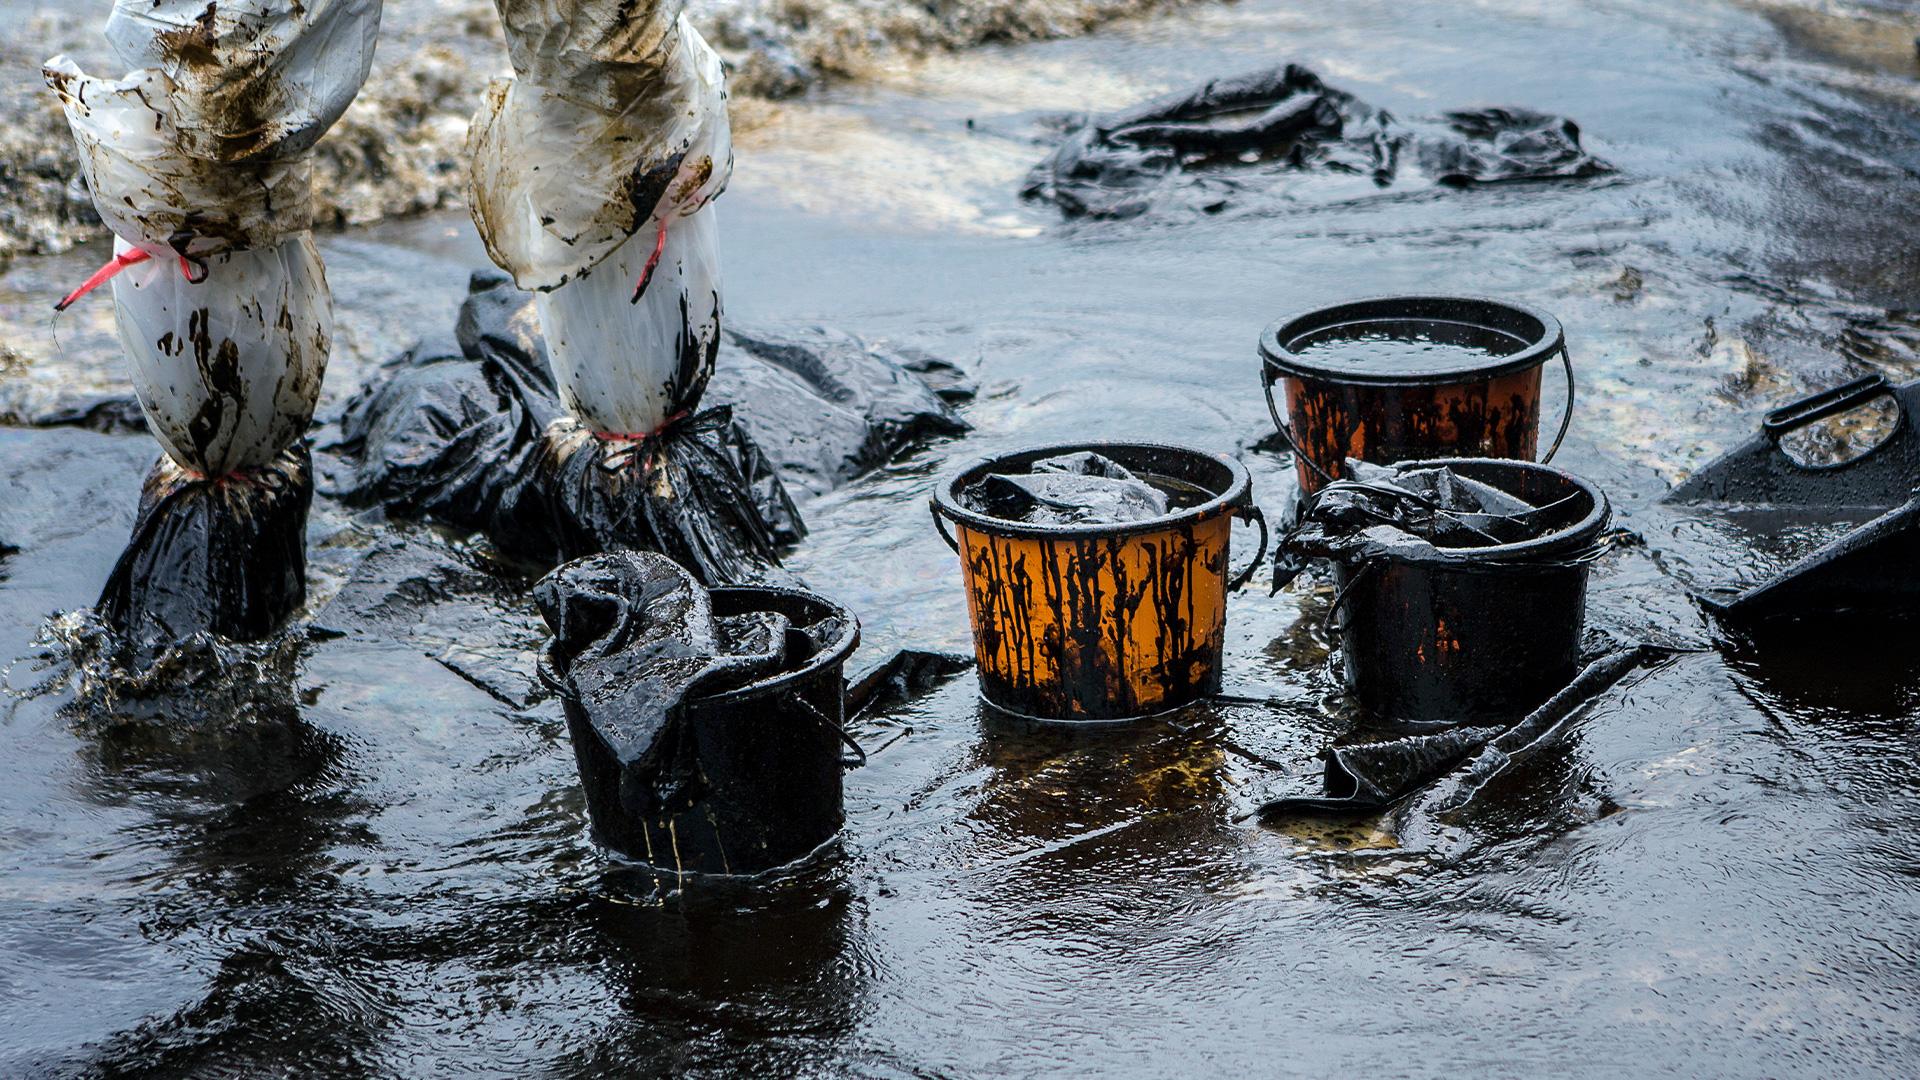 Das focus legale responsabilita per inquinamento marino normativa italiana 16062021